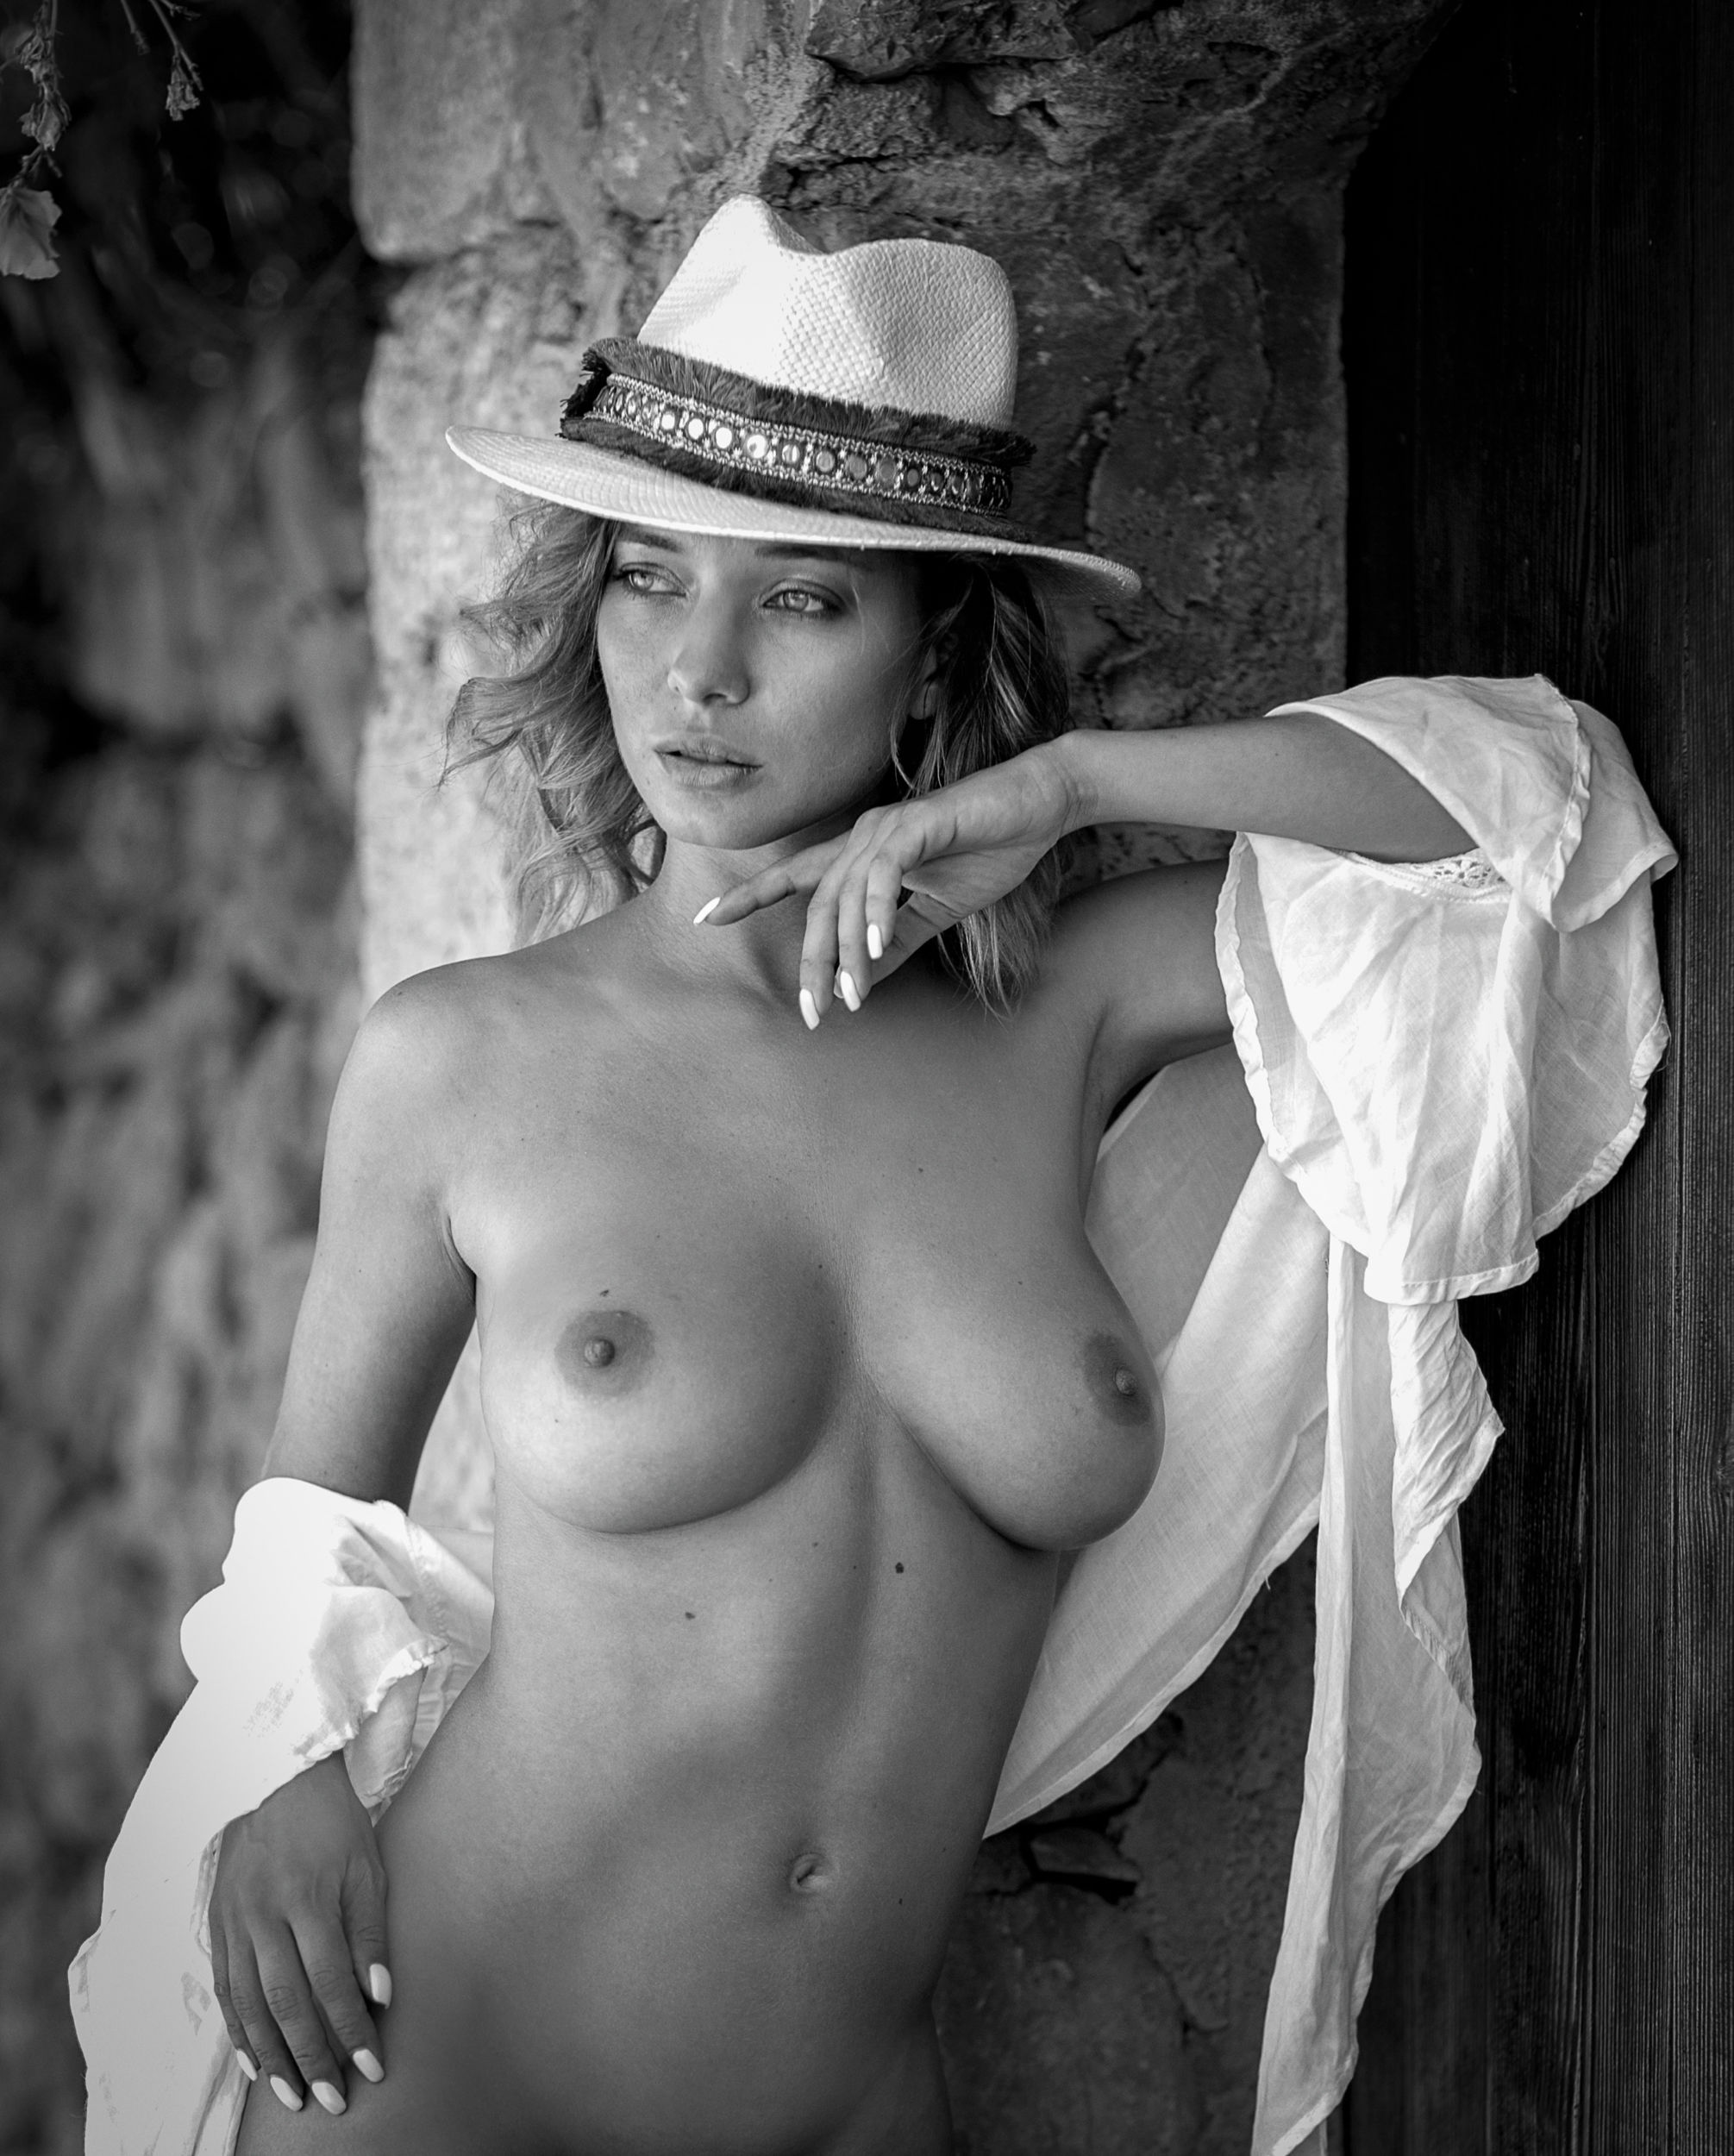 Natali Andreeva - Dieter Kaupp photoshoot